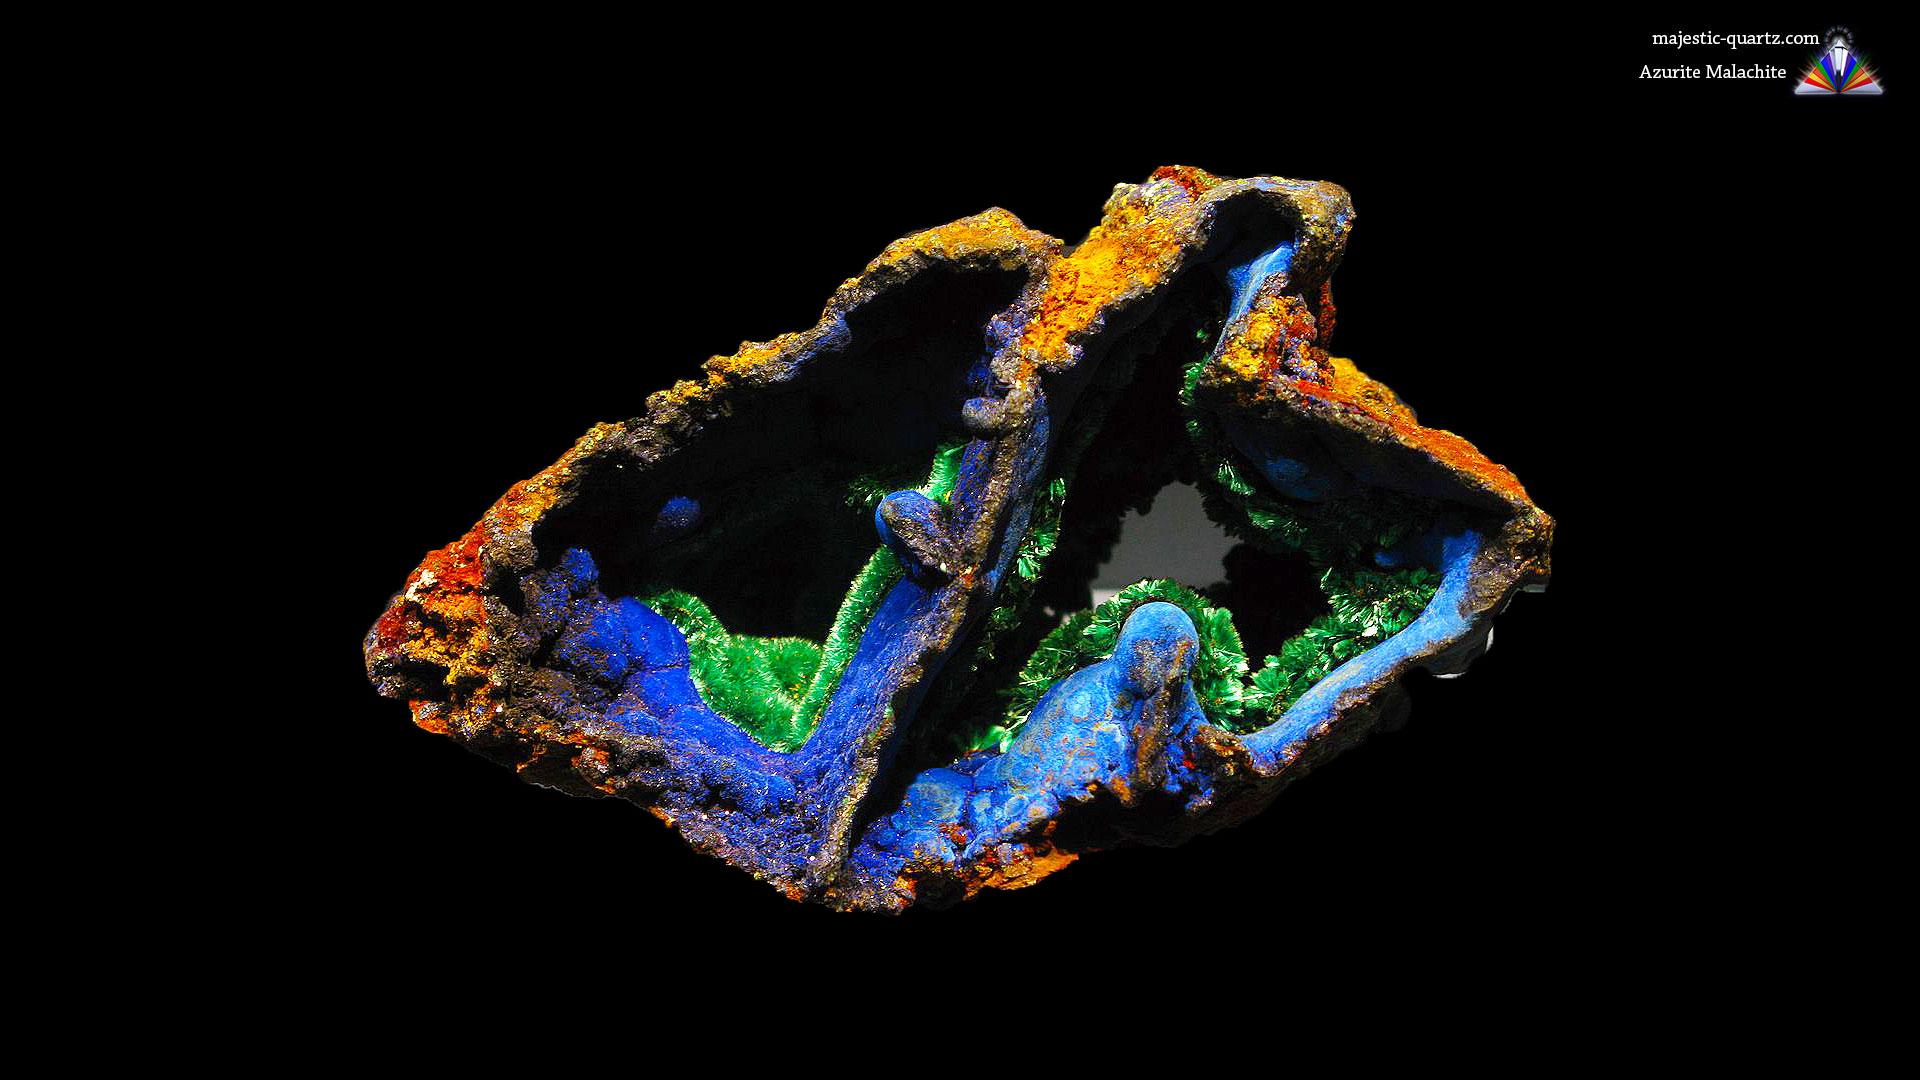 Azurite Malachite Crystal Specimen - Mineral Specimen